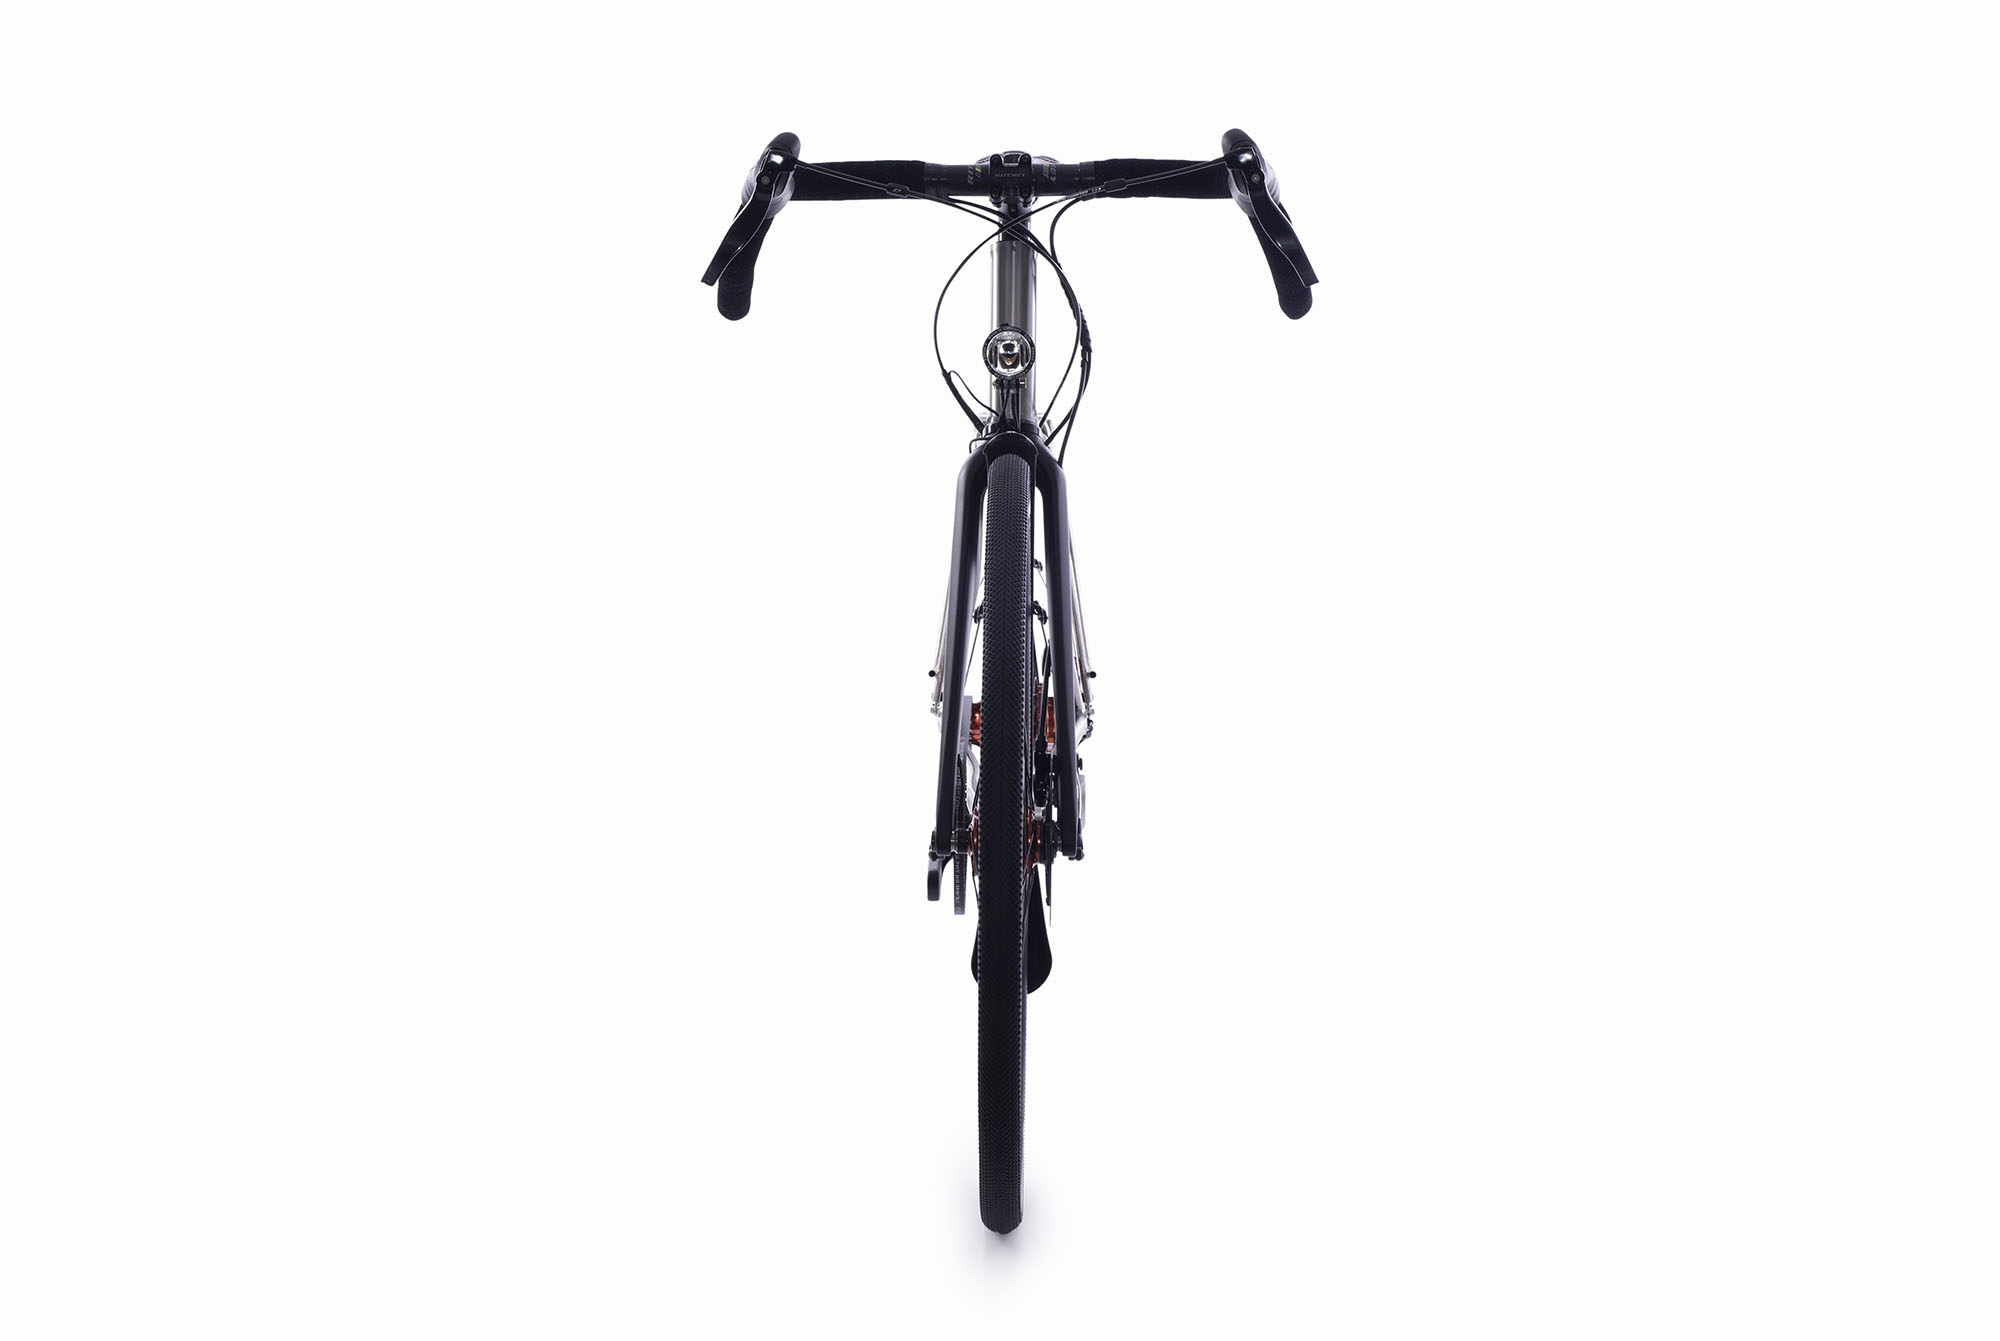 Francis' Titan Rohloff Gravel Bike _ 3